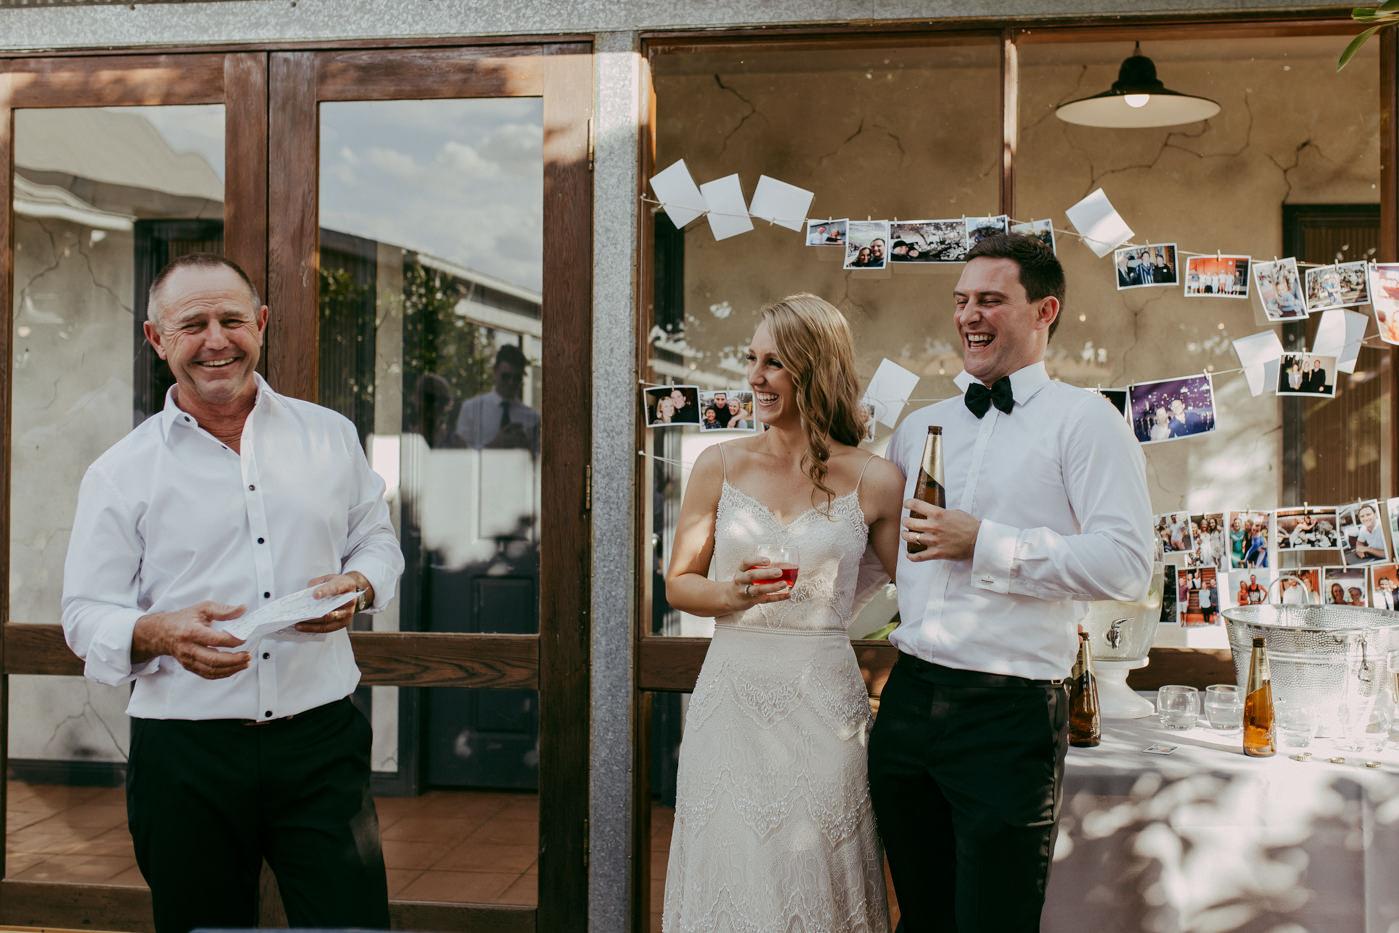 Anthony & Eliet - Wagga Wagga Wedding - Country NSW - Samantha Heather Photography-122.jpg